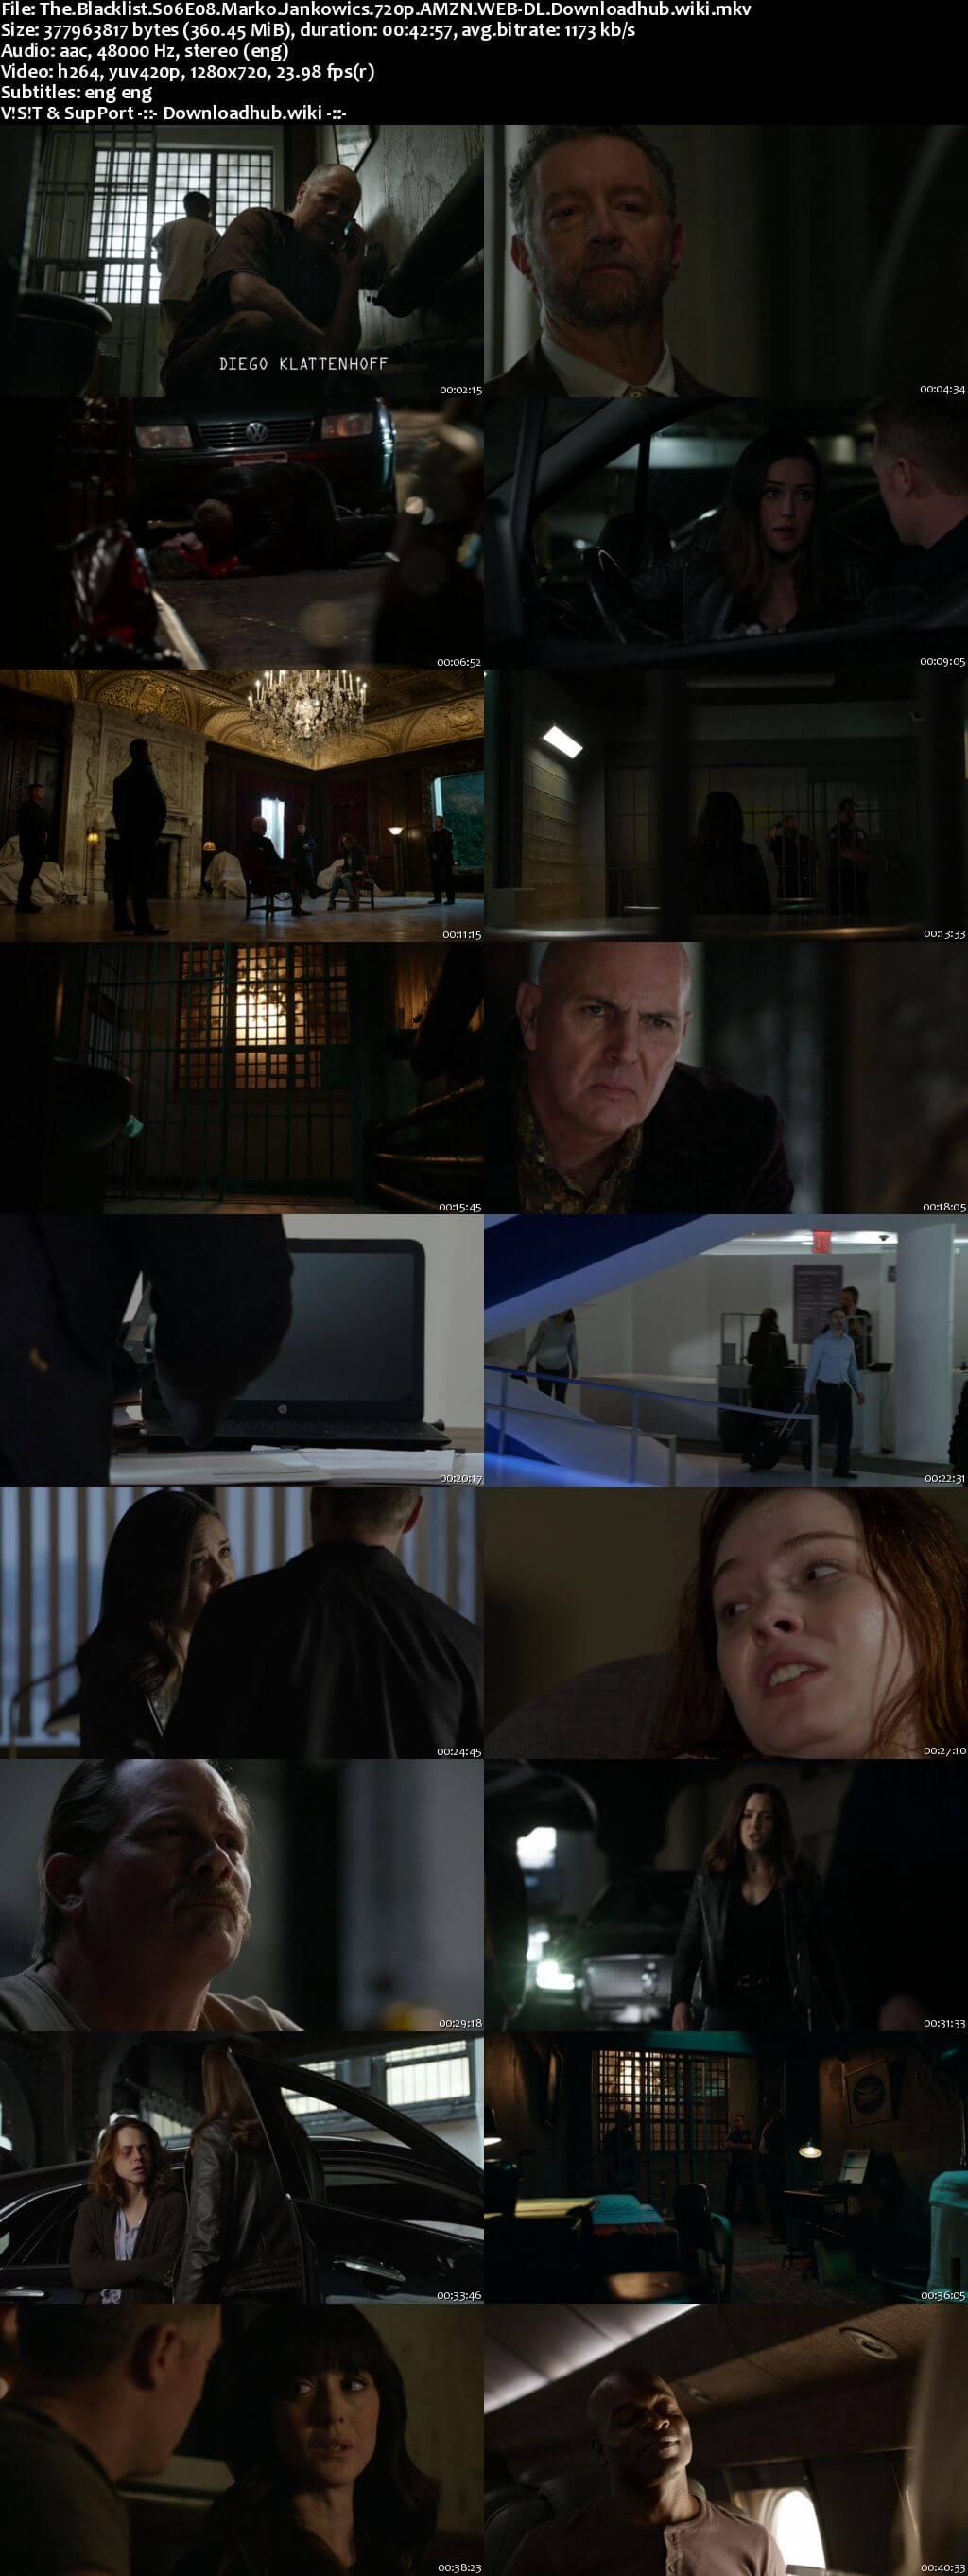 The Blacklist S06E08 350MB AMZN WEB-DL 720p ESubs